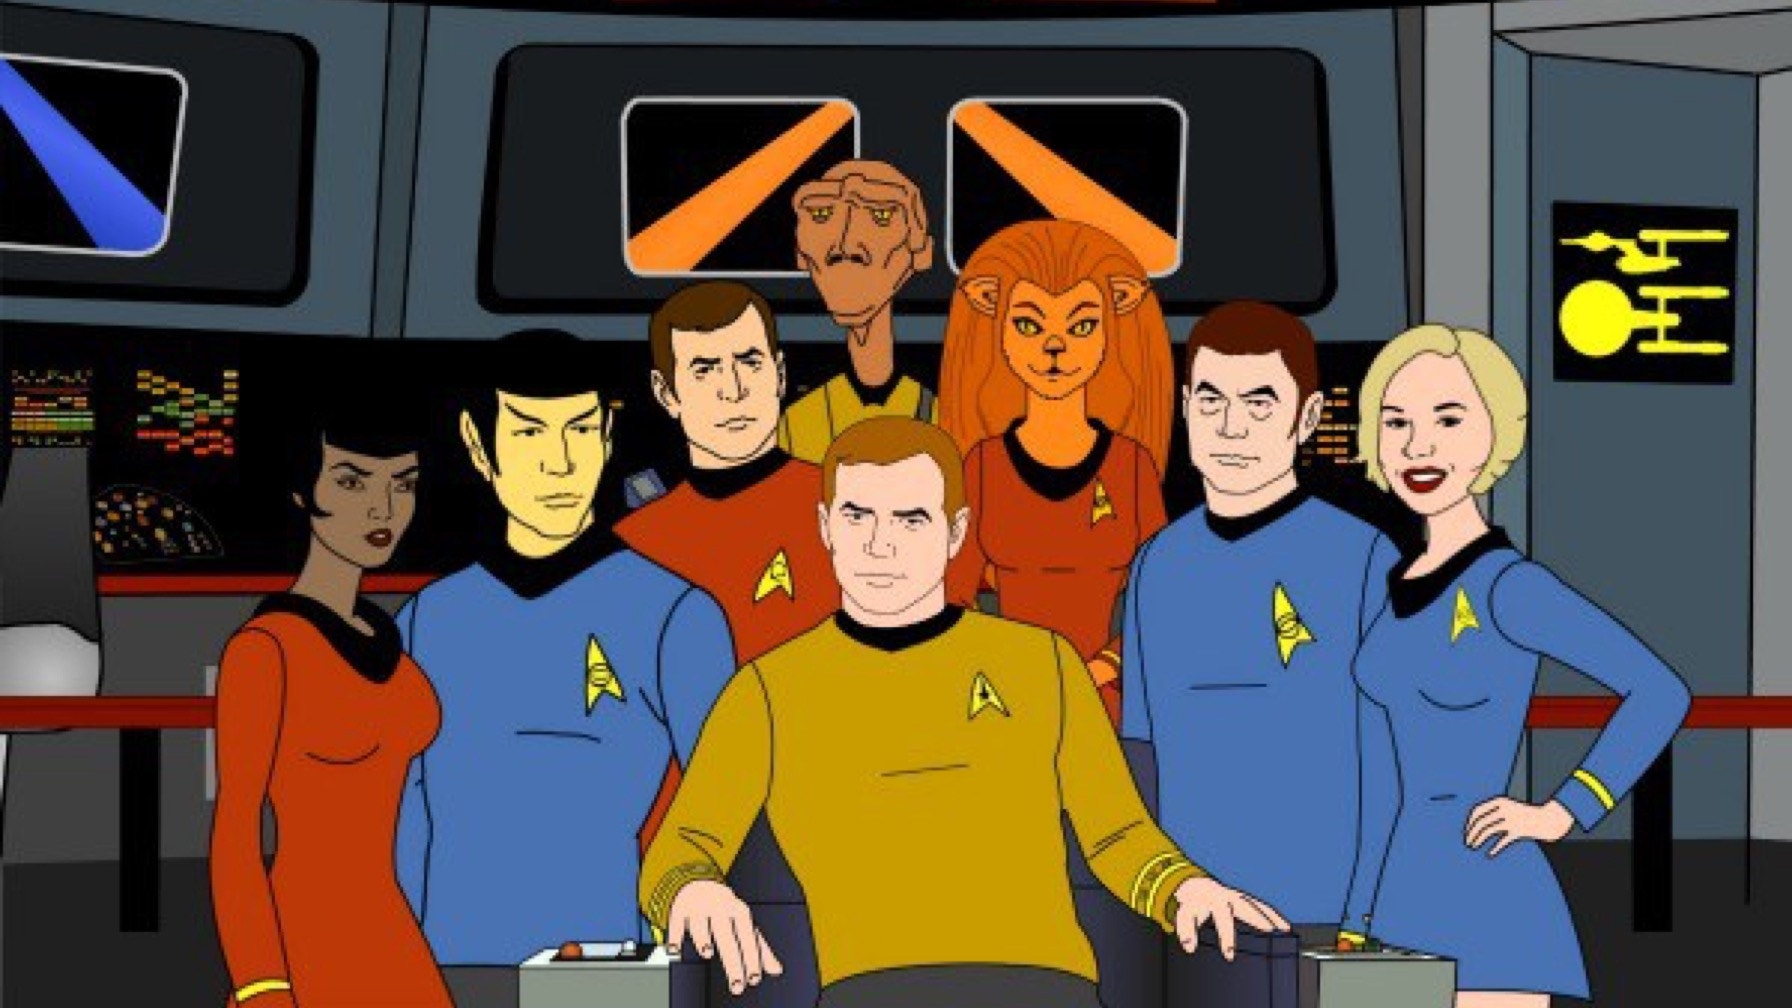 New Star Trek Cartoon Is Aimed at a New Generation of Fans